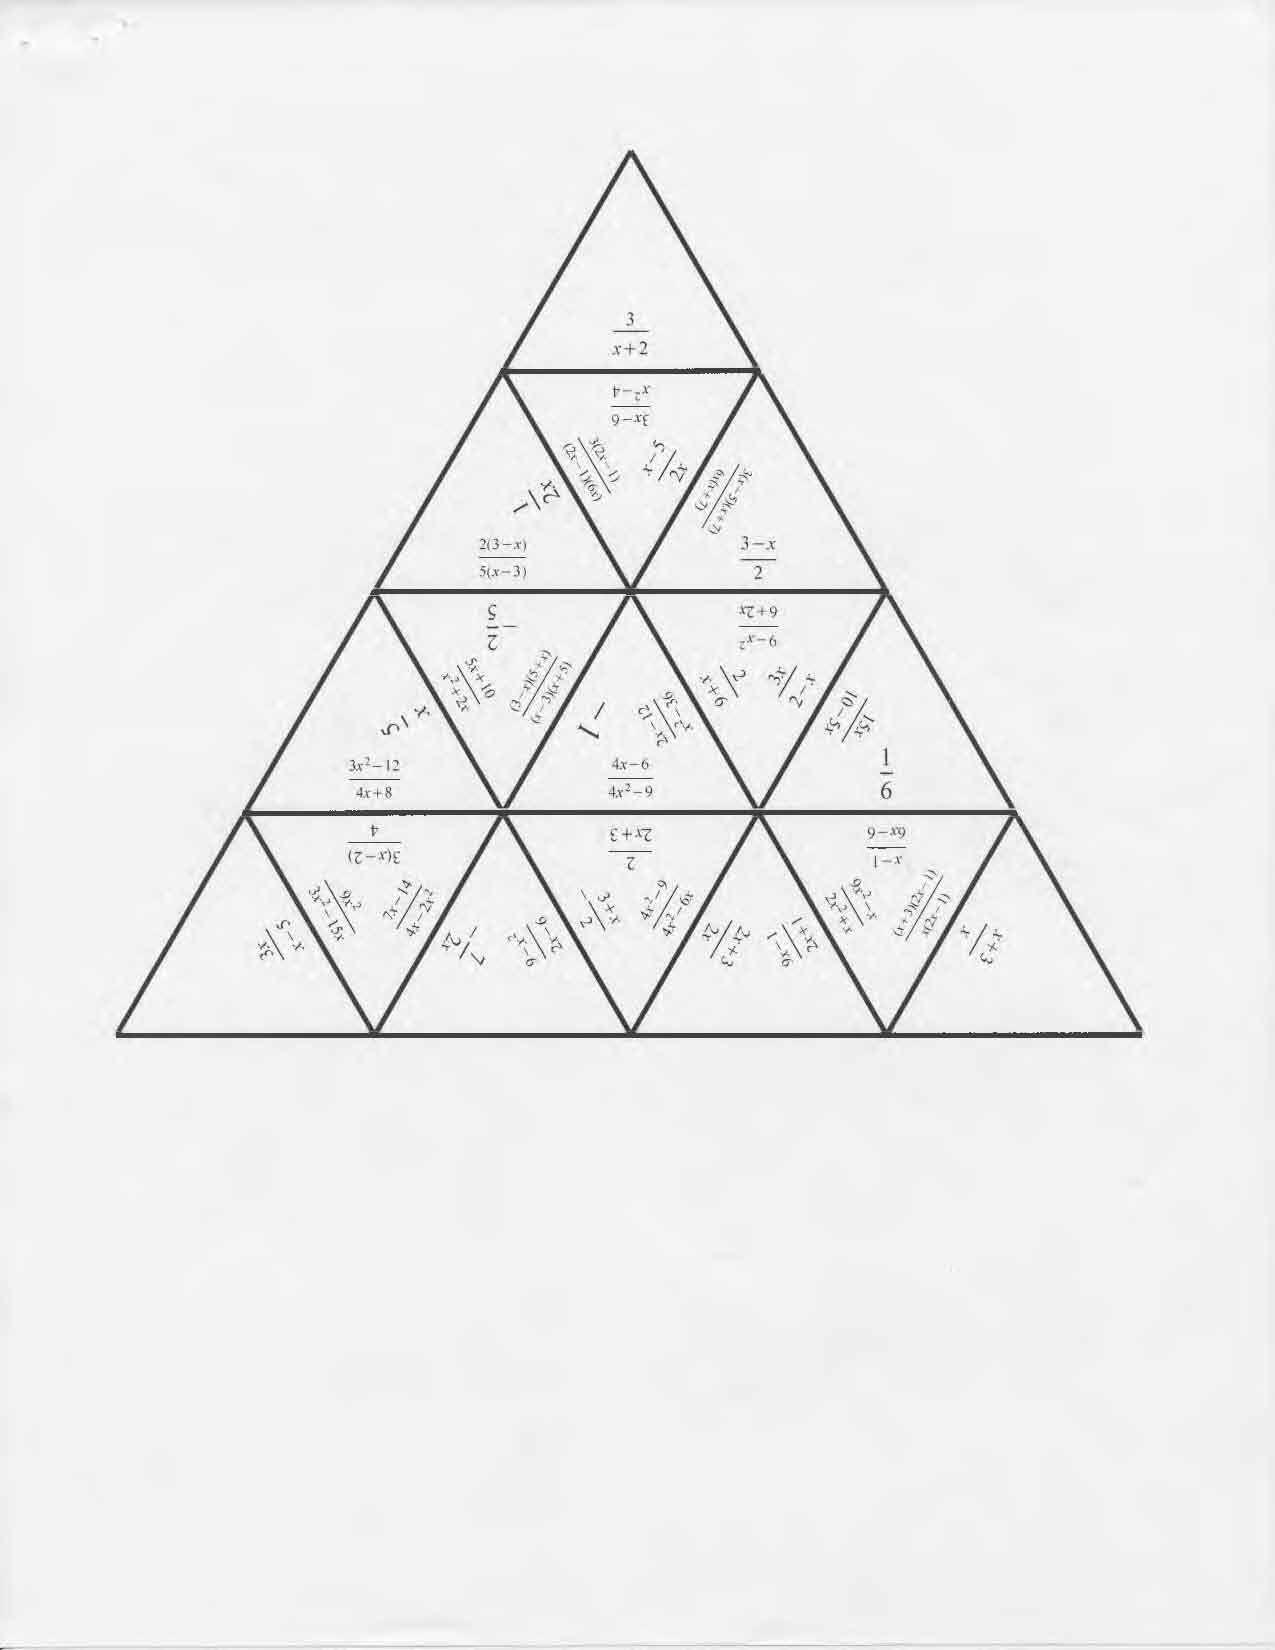 Tarsia Puzzle Simplify Rational Expressions | Algebra | Simplifying - Printable Tarsia Puzzles English